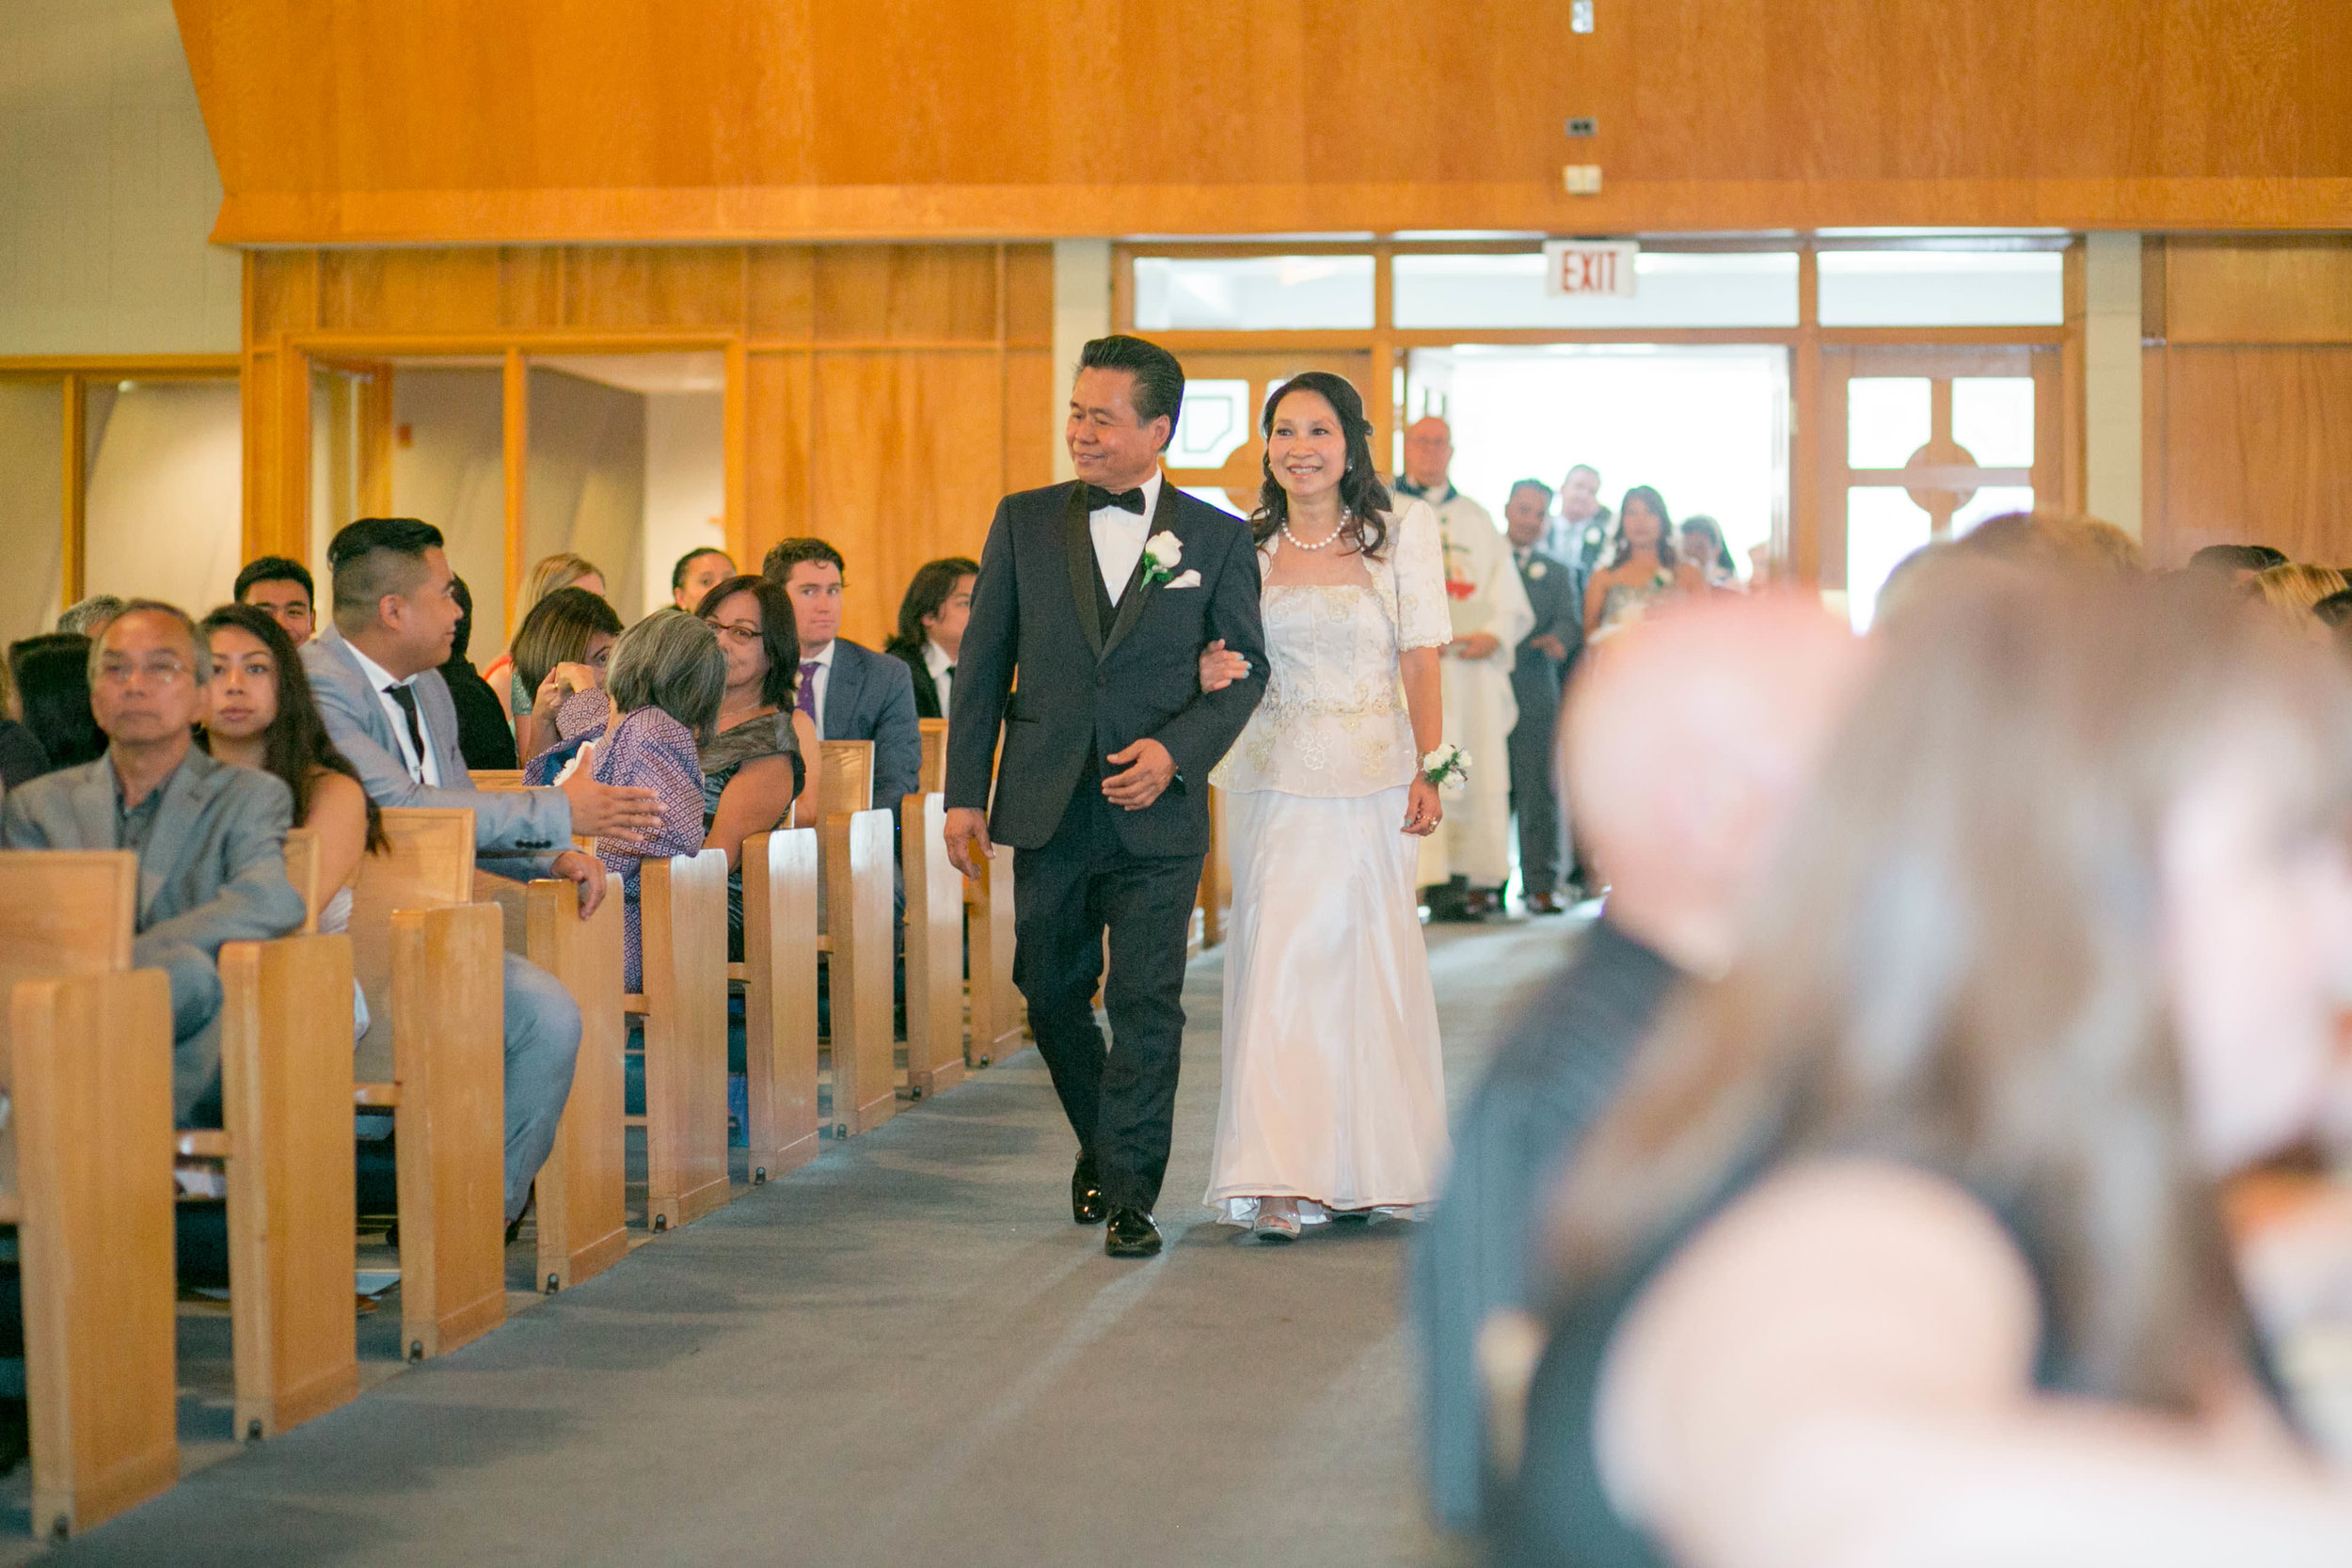 Stefanie___Bernard___Daniel_Ricci_Weddings_High_Res._Finals__202.jpg